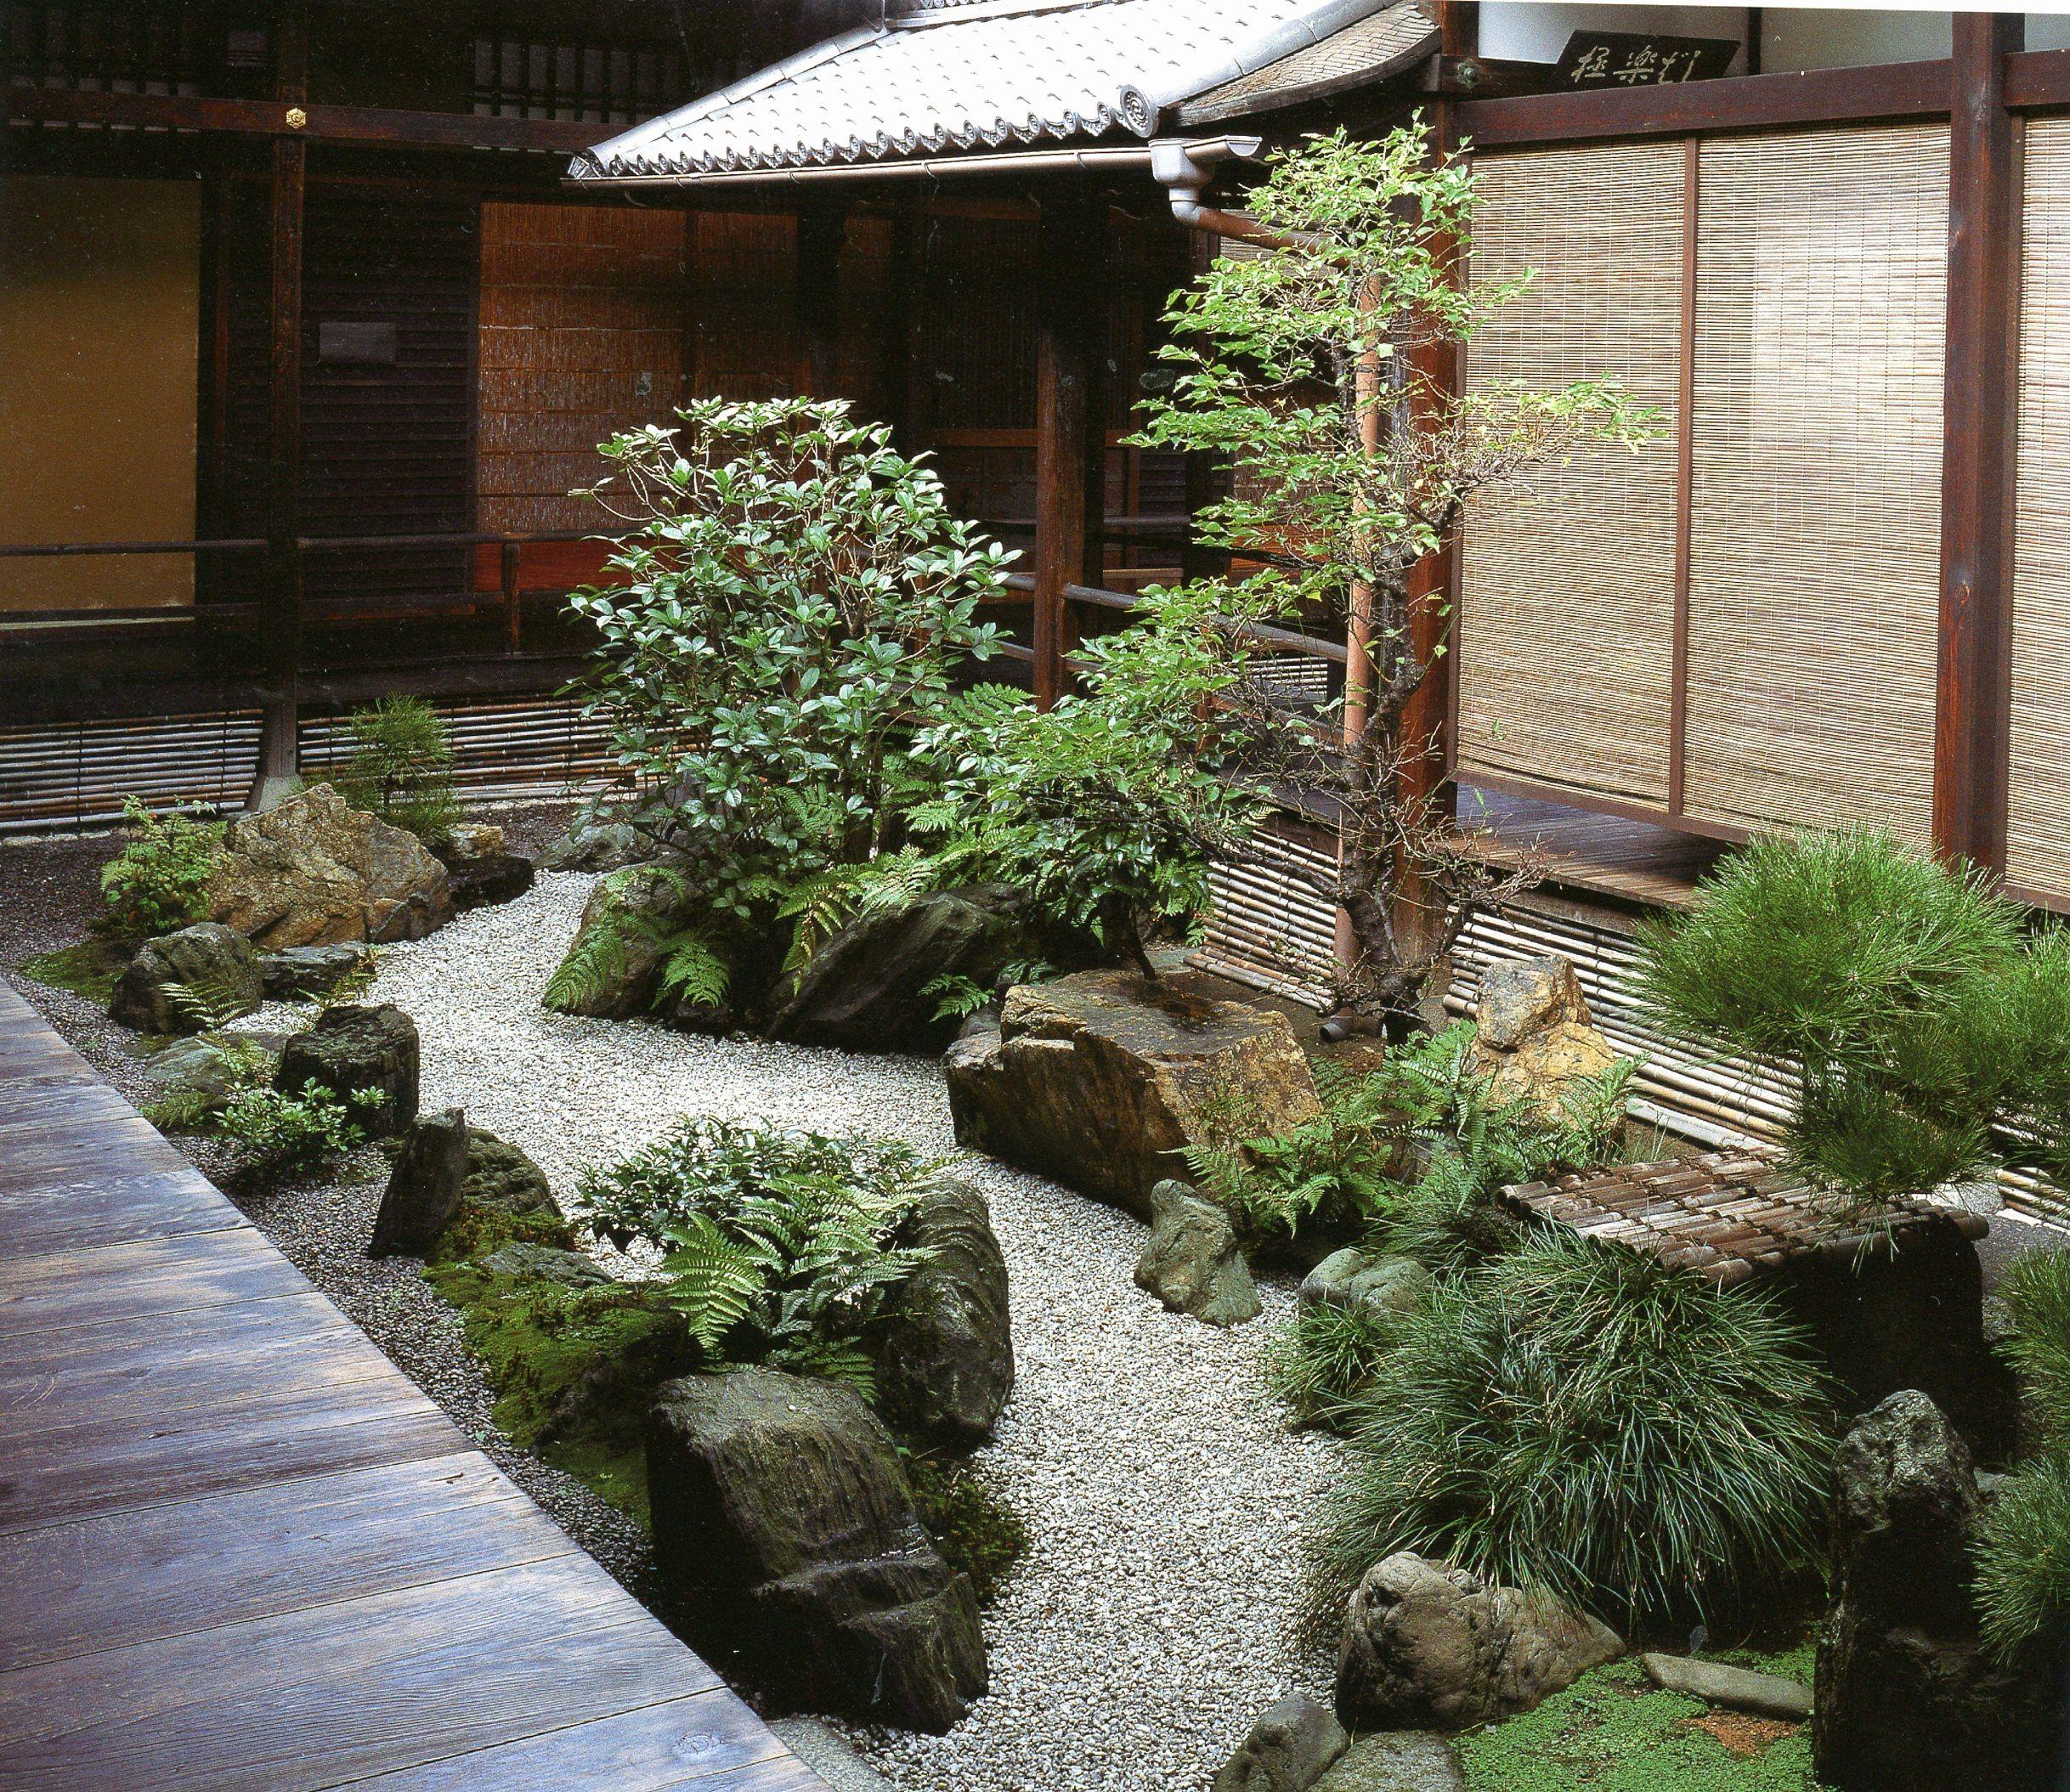 marvelous japanese zen garden design | Pin by silvalandscapes on japanese gardens | Small ...